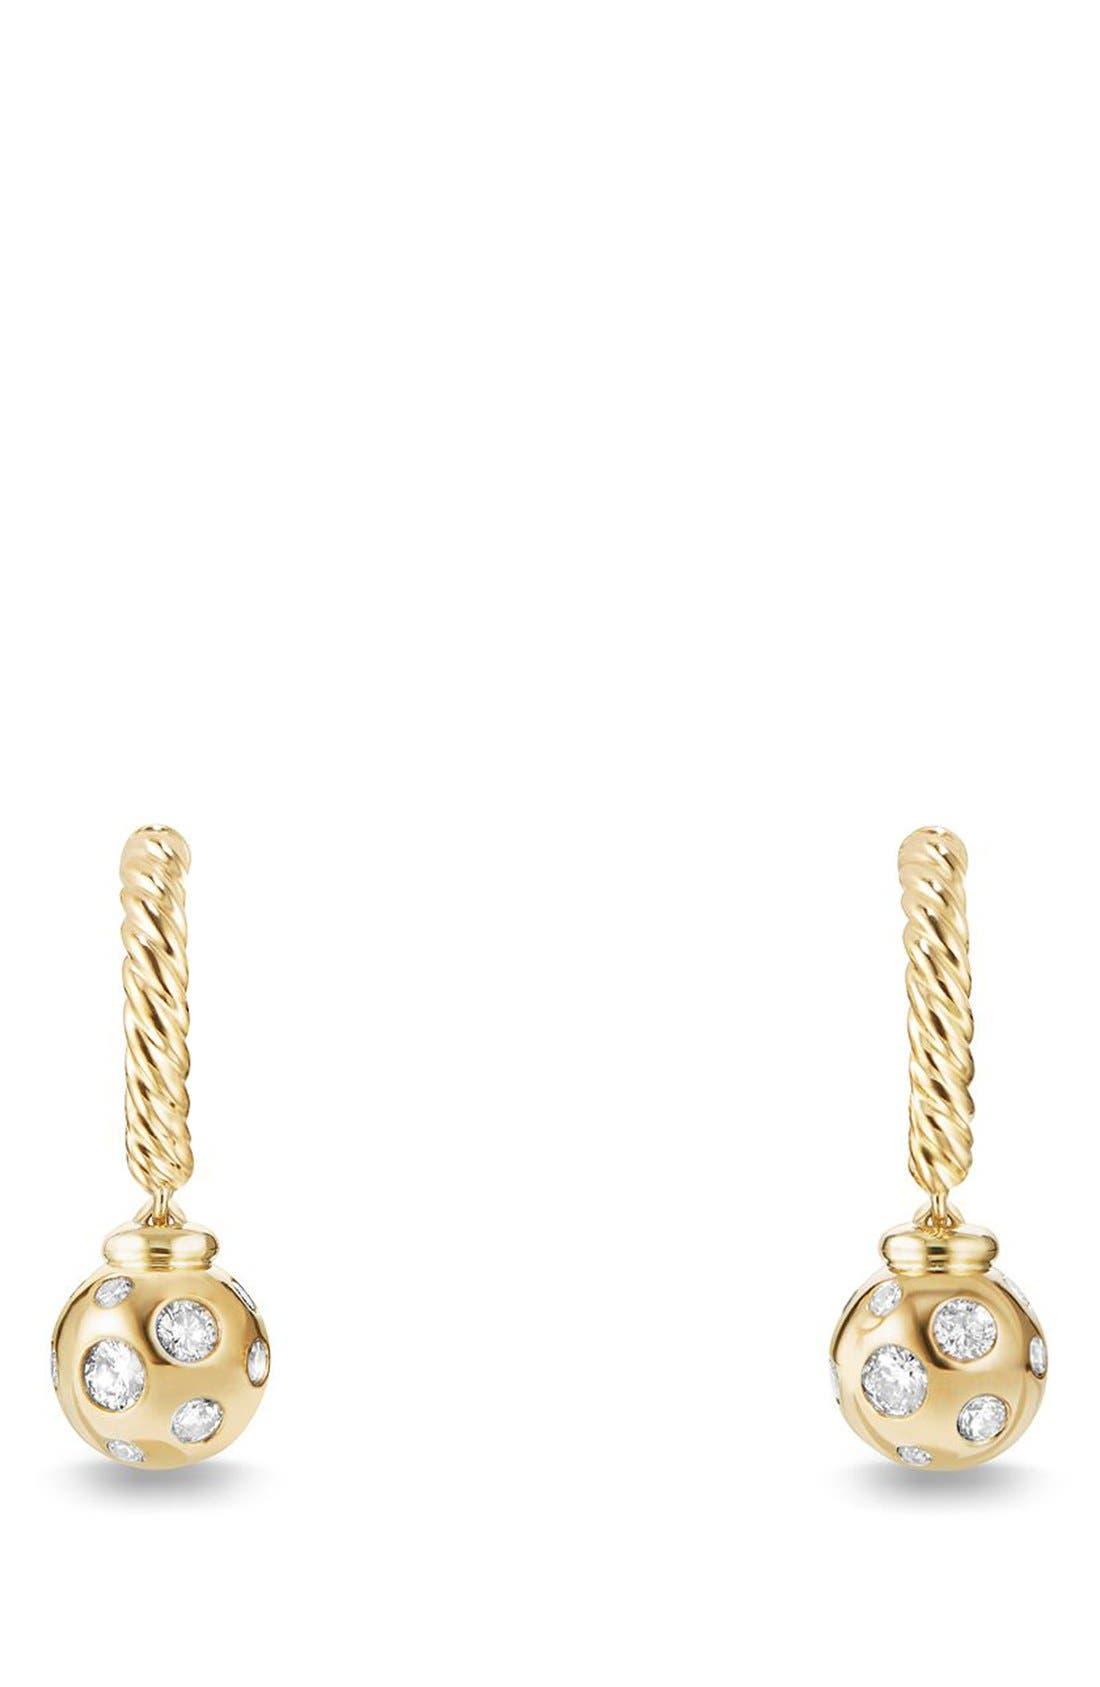 DAVID YURMAN Solari Hoop Earrings with Diamonds in 18K Gold